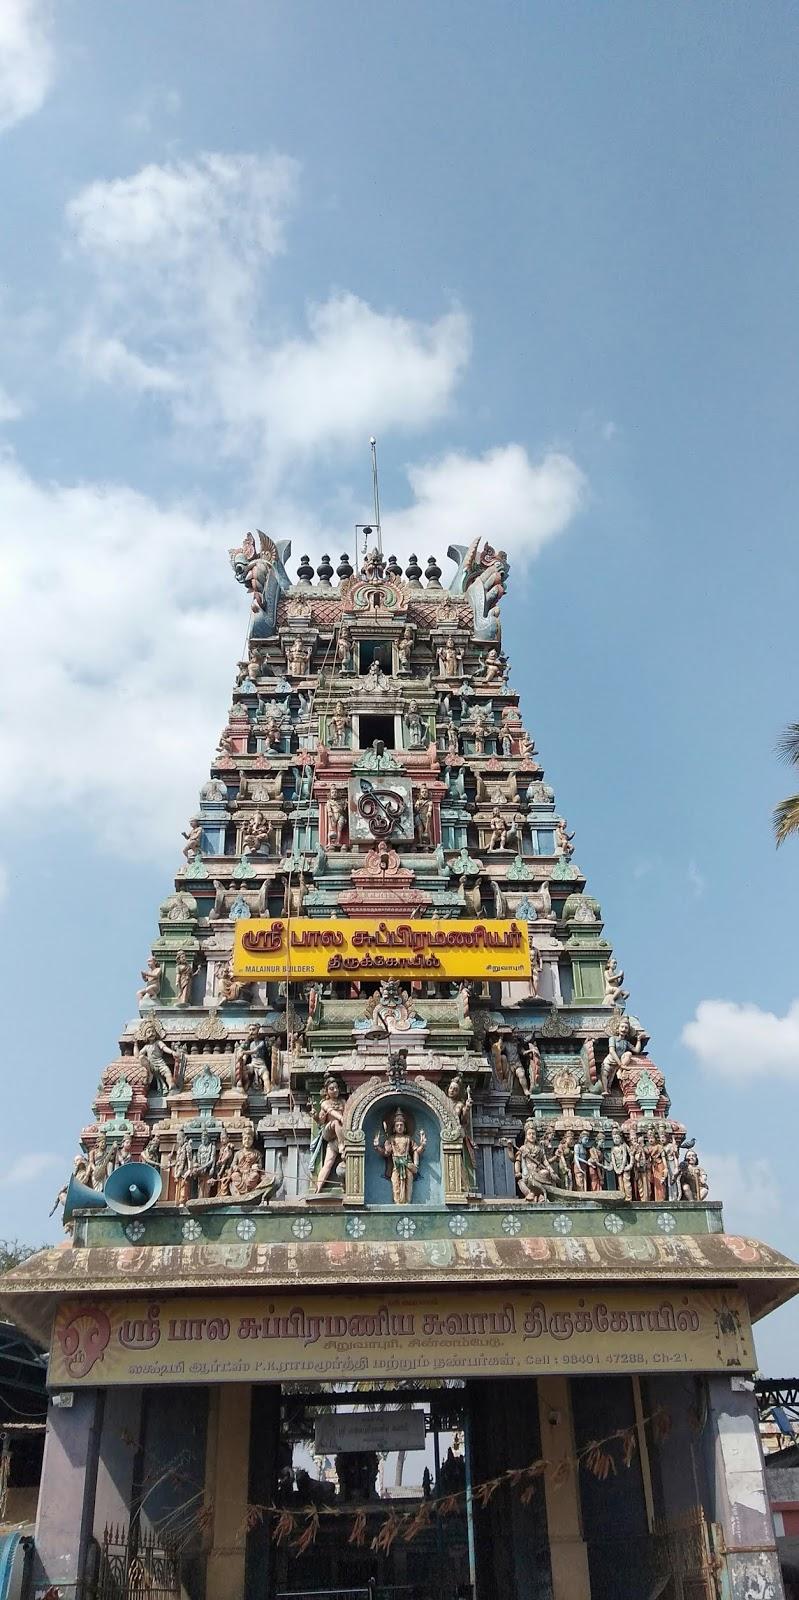 Dream of buying a new house or housewarming accomplish by worshipping Balasubrahmanyam in siruvapuri